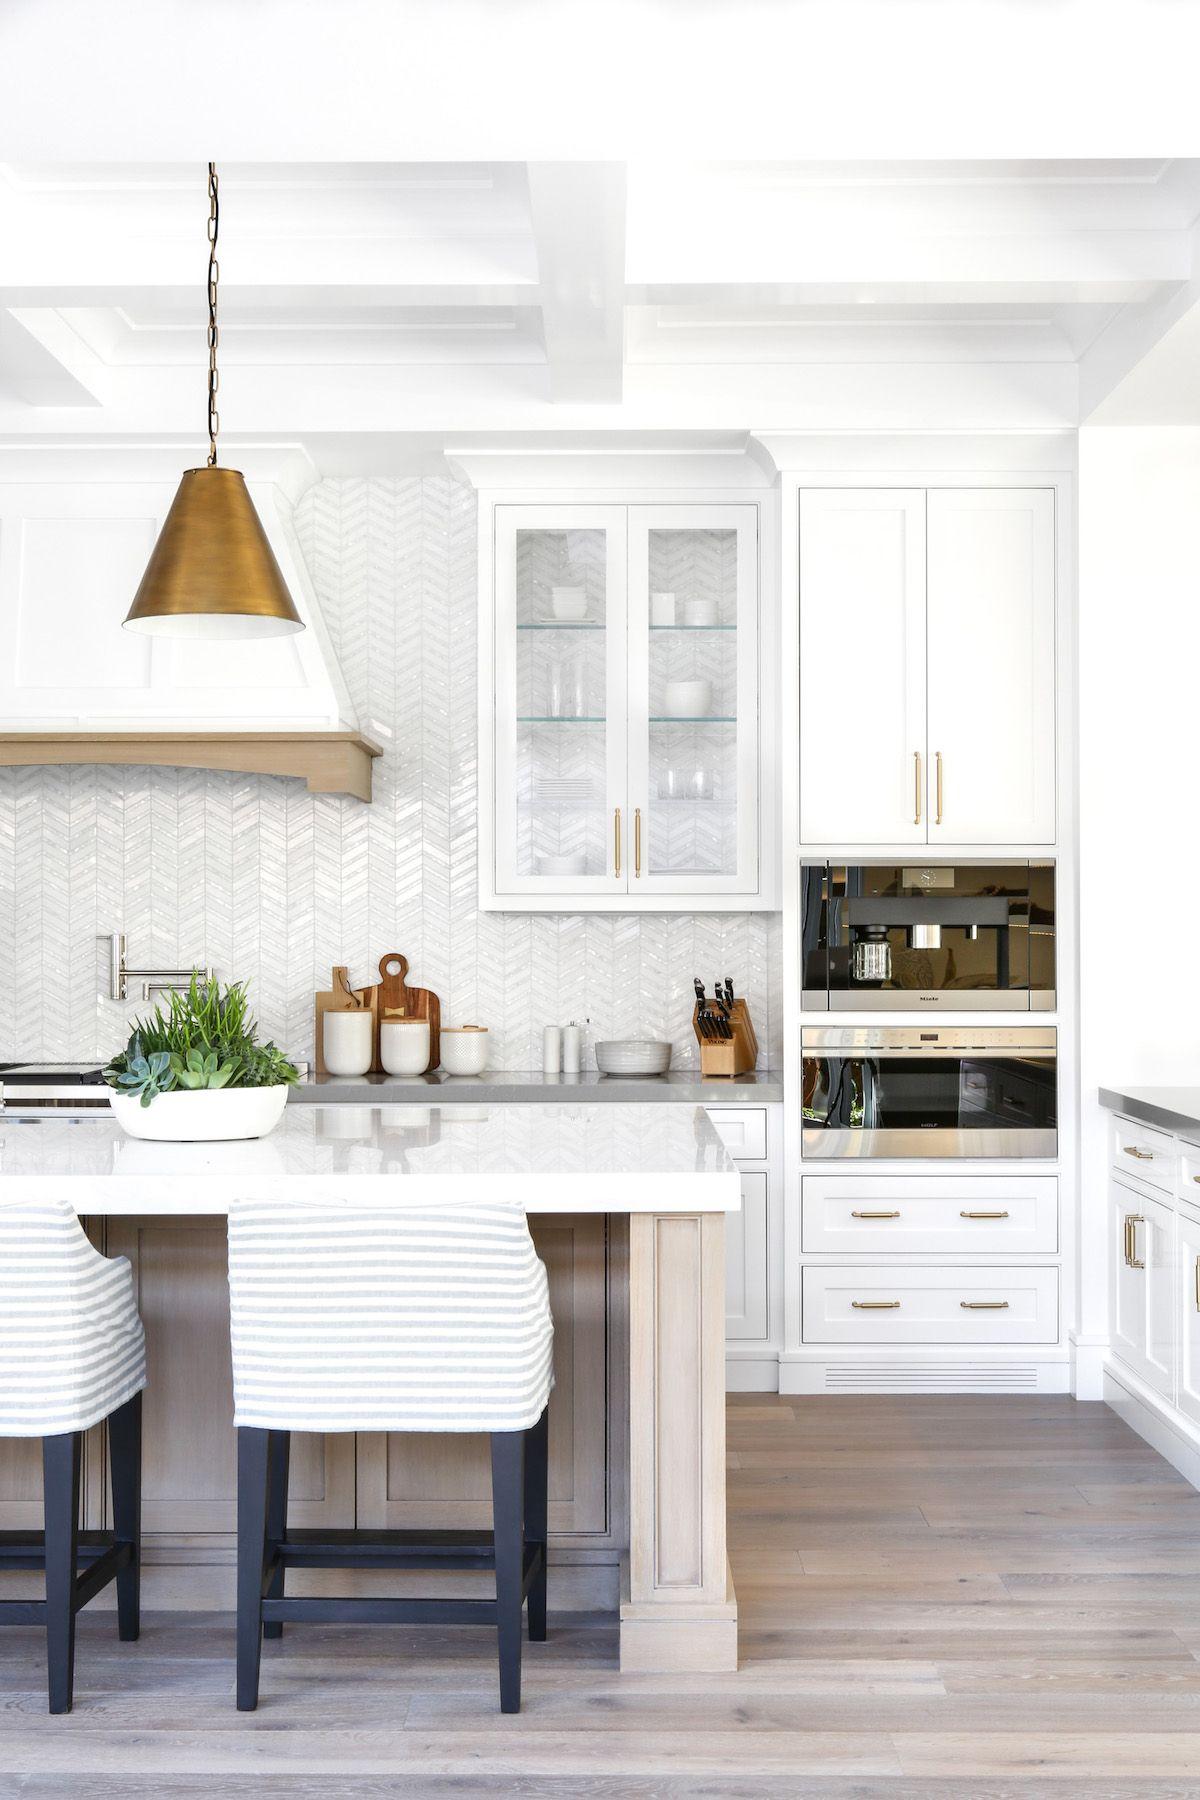 A Newport Beach Home With A Stunning Kitchen Interior Design